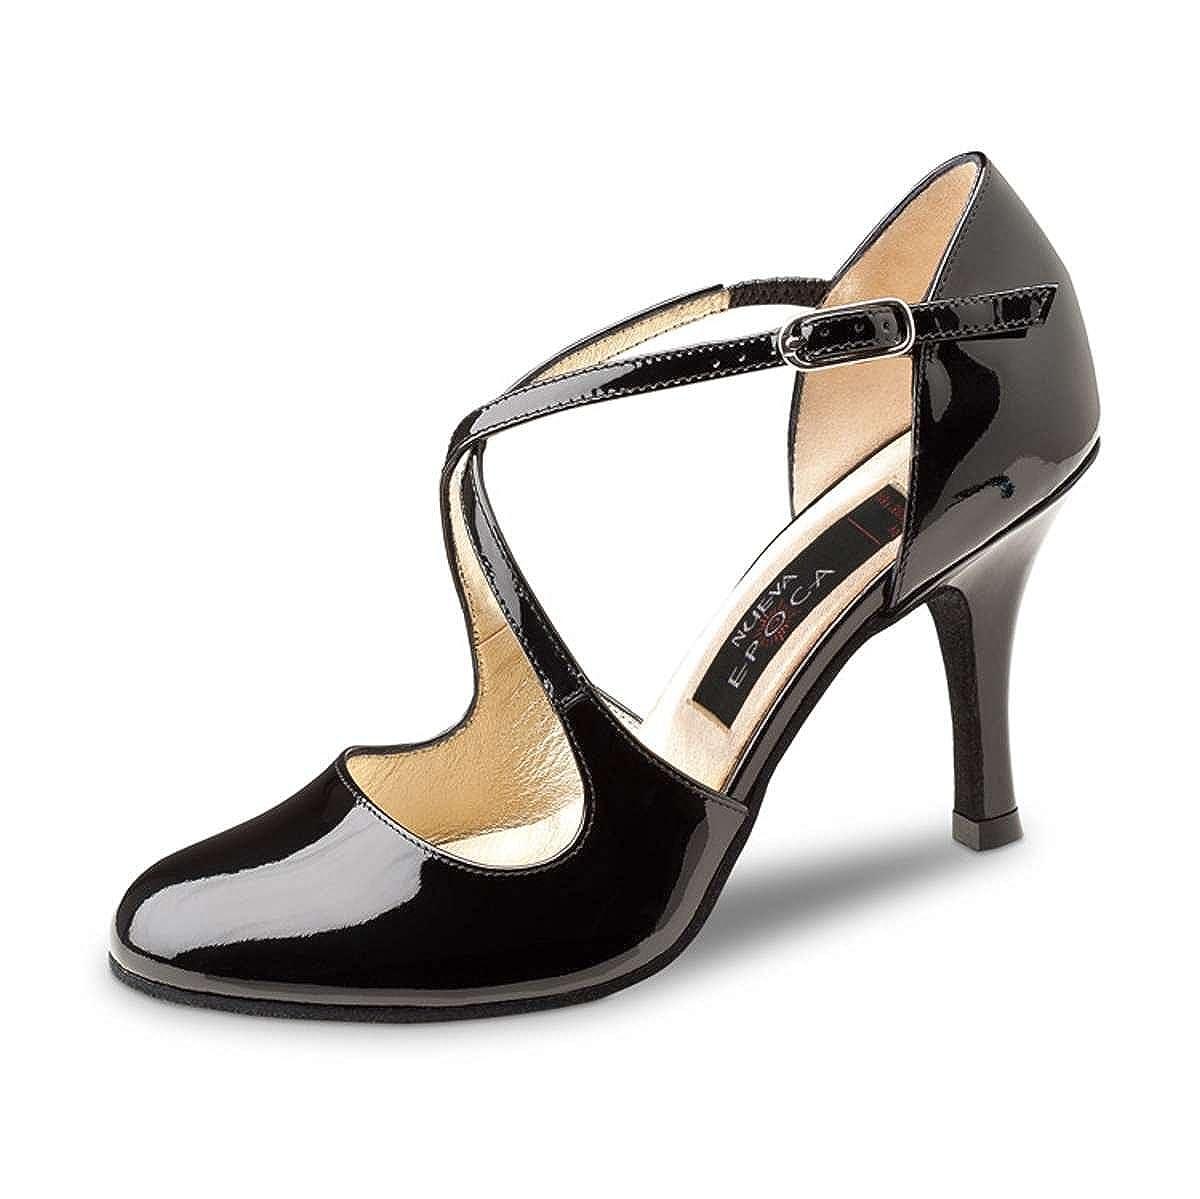 /8/cm Nueva Epoca/ /Tango//Salsa Femme Chaussures de Danse Loupe/ /Vernis Noir/